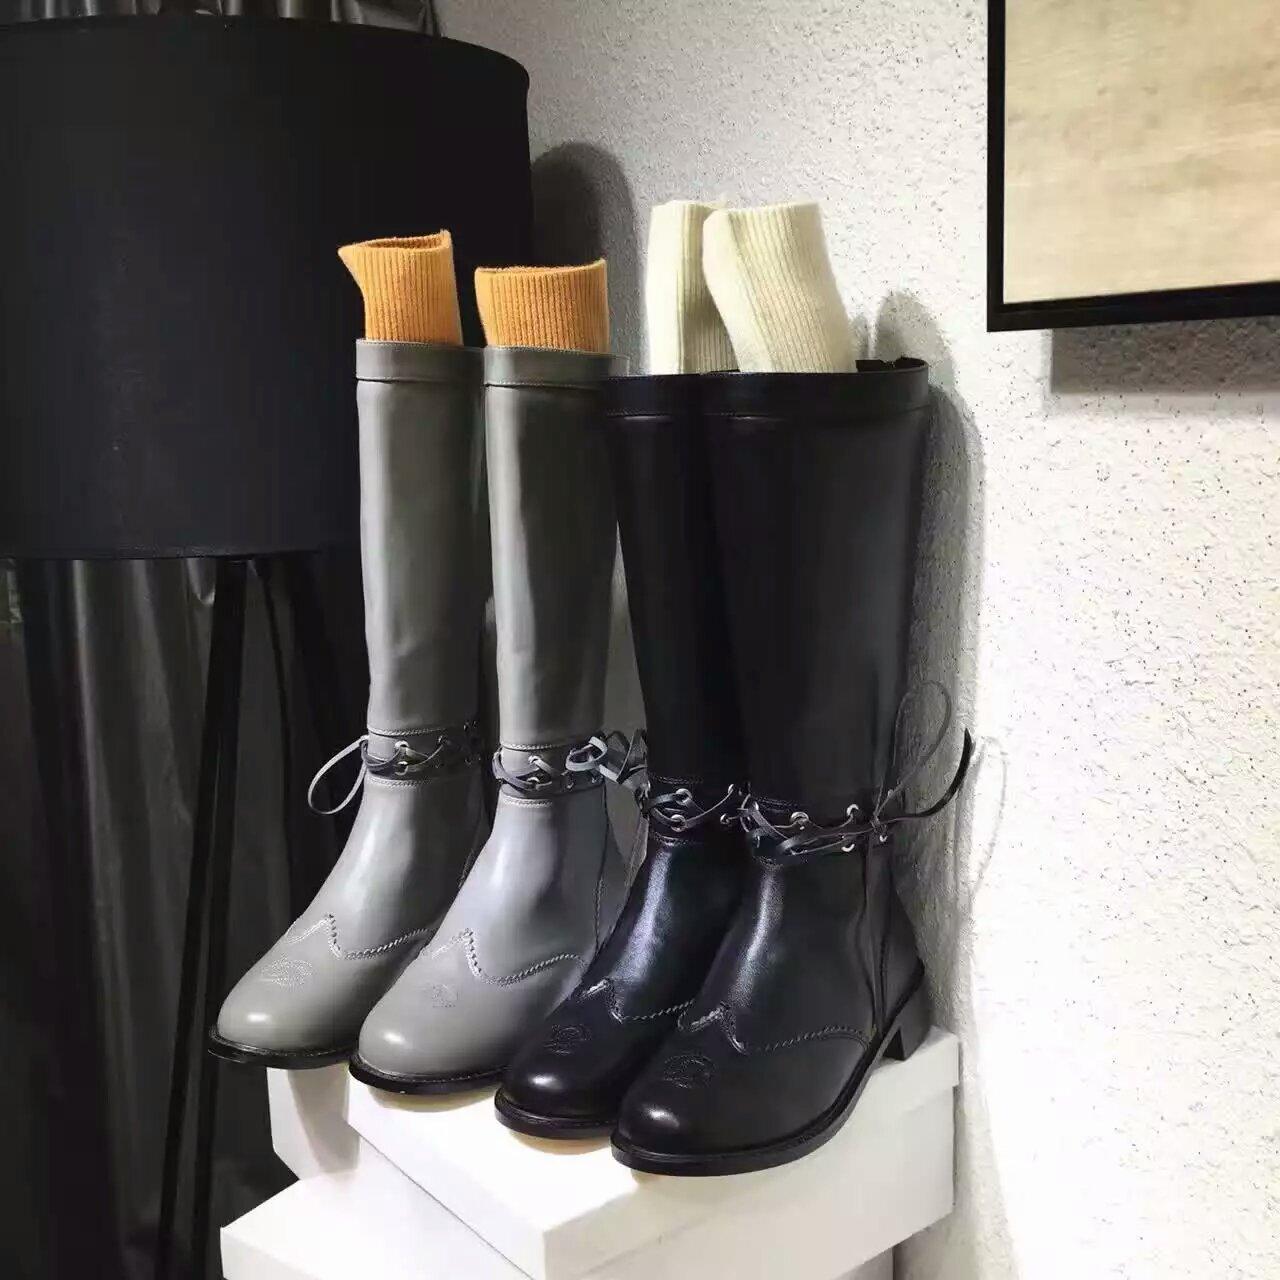 Chanel(香奈儿)16秋冬新款系带镂空直筒靴 宋茜同款长靴